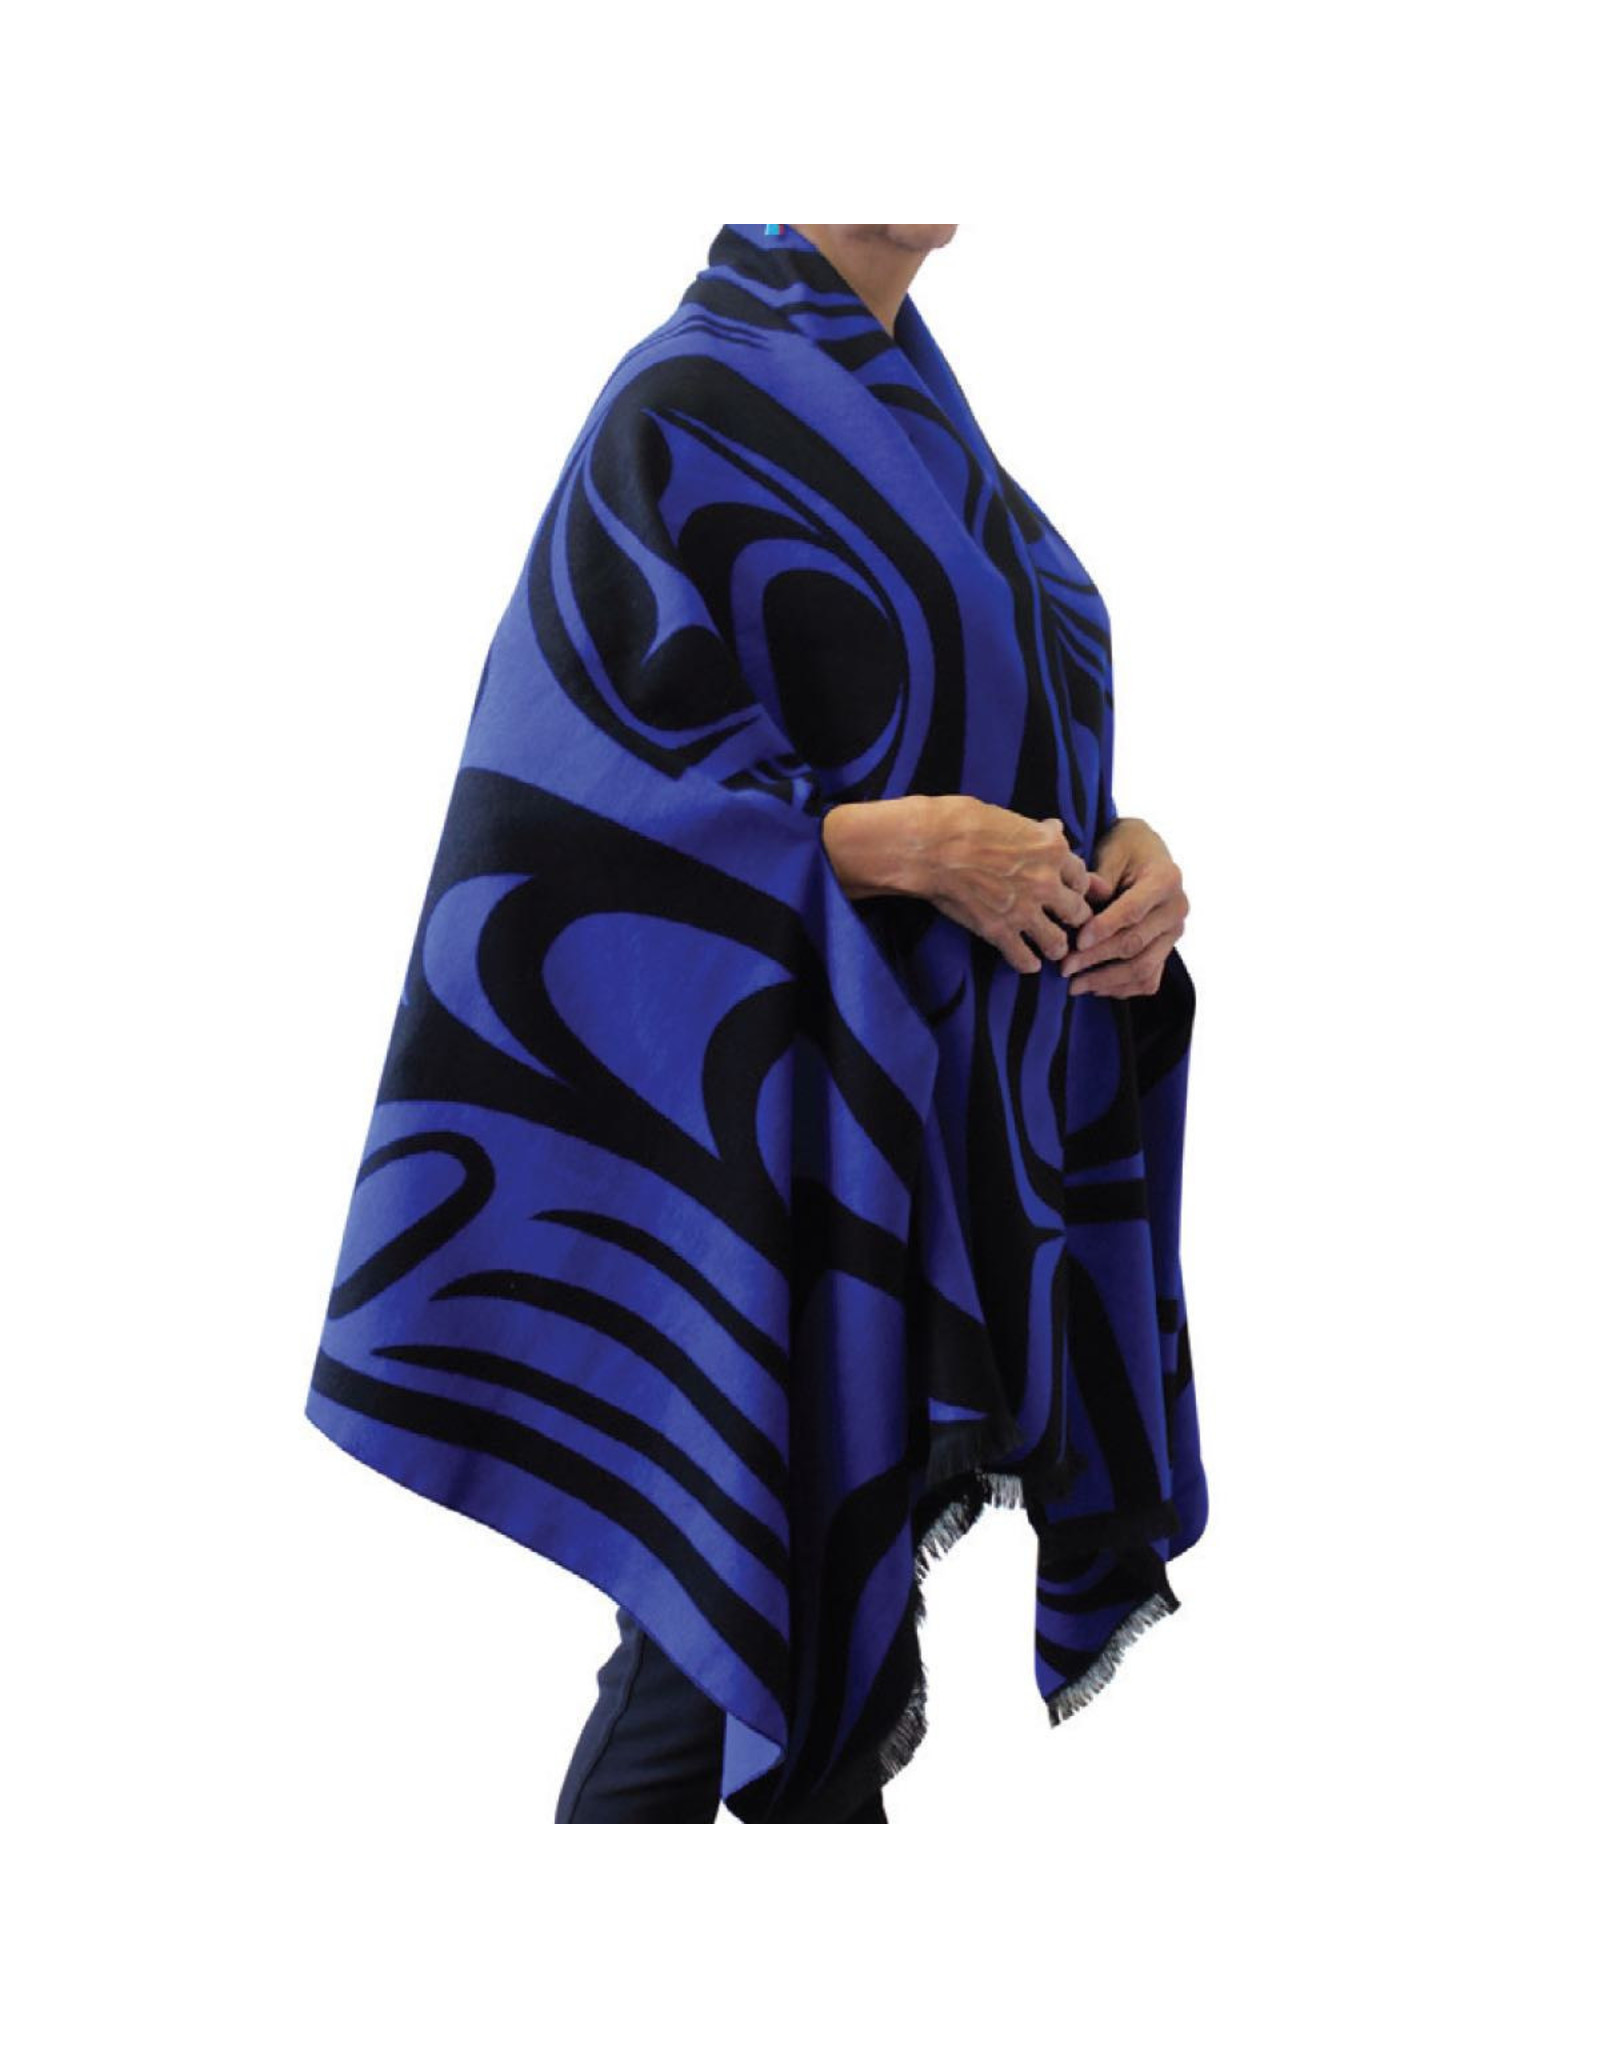 Reversible Fashion Cape - Spirit Wolf by Paul Windsor (Black & Blue)